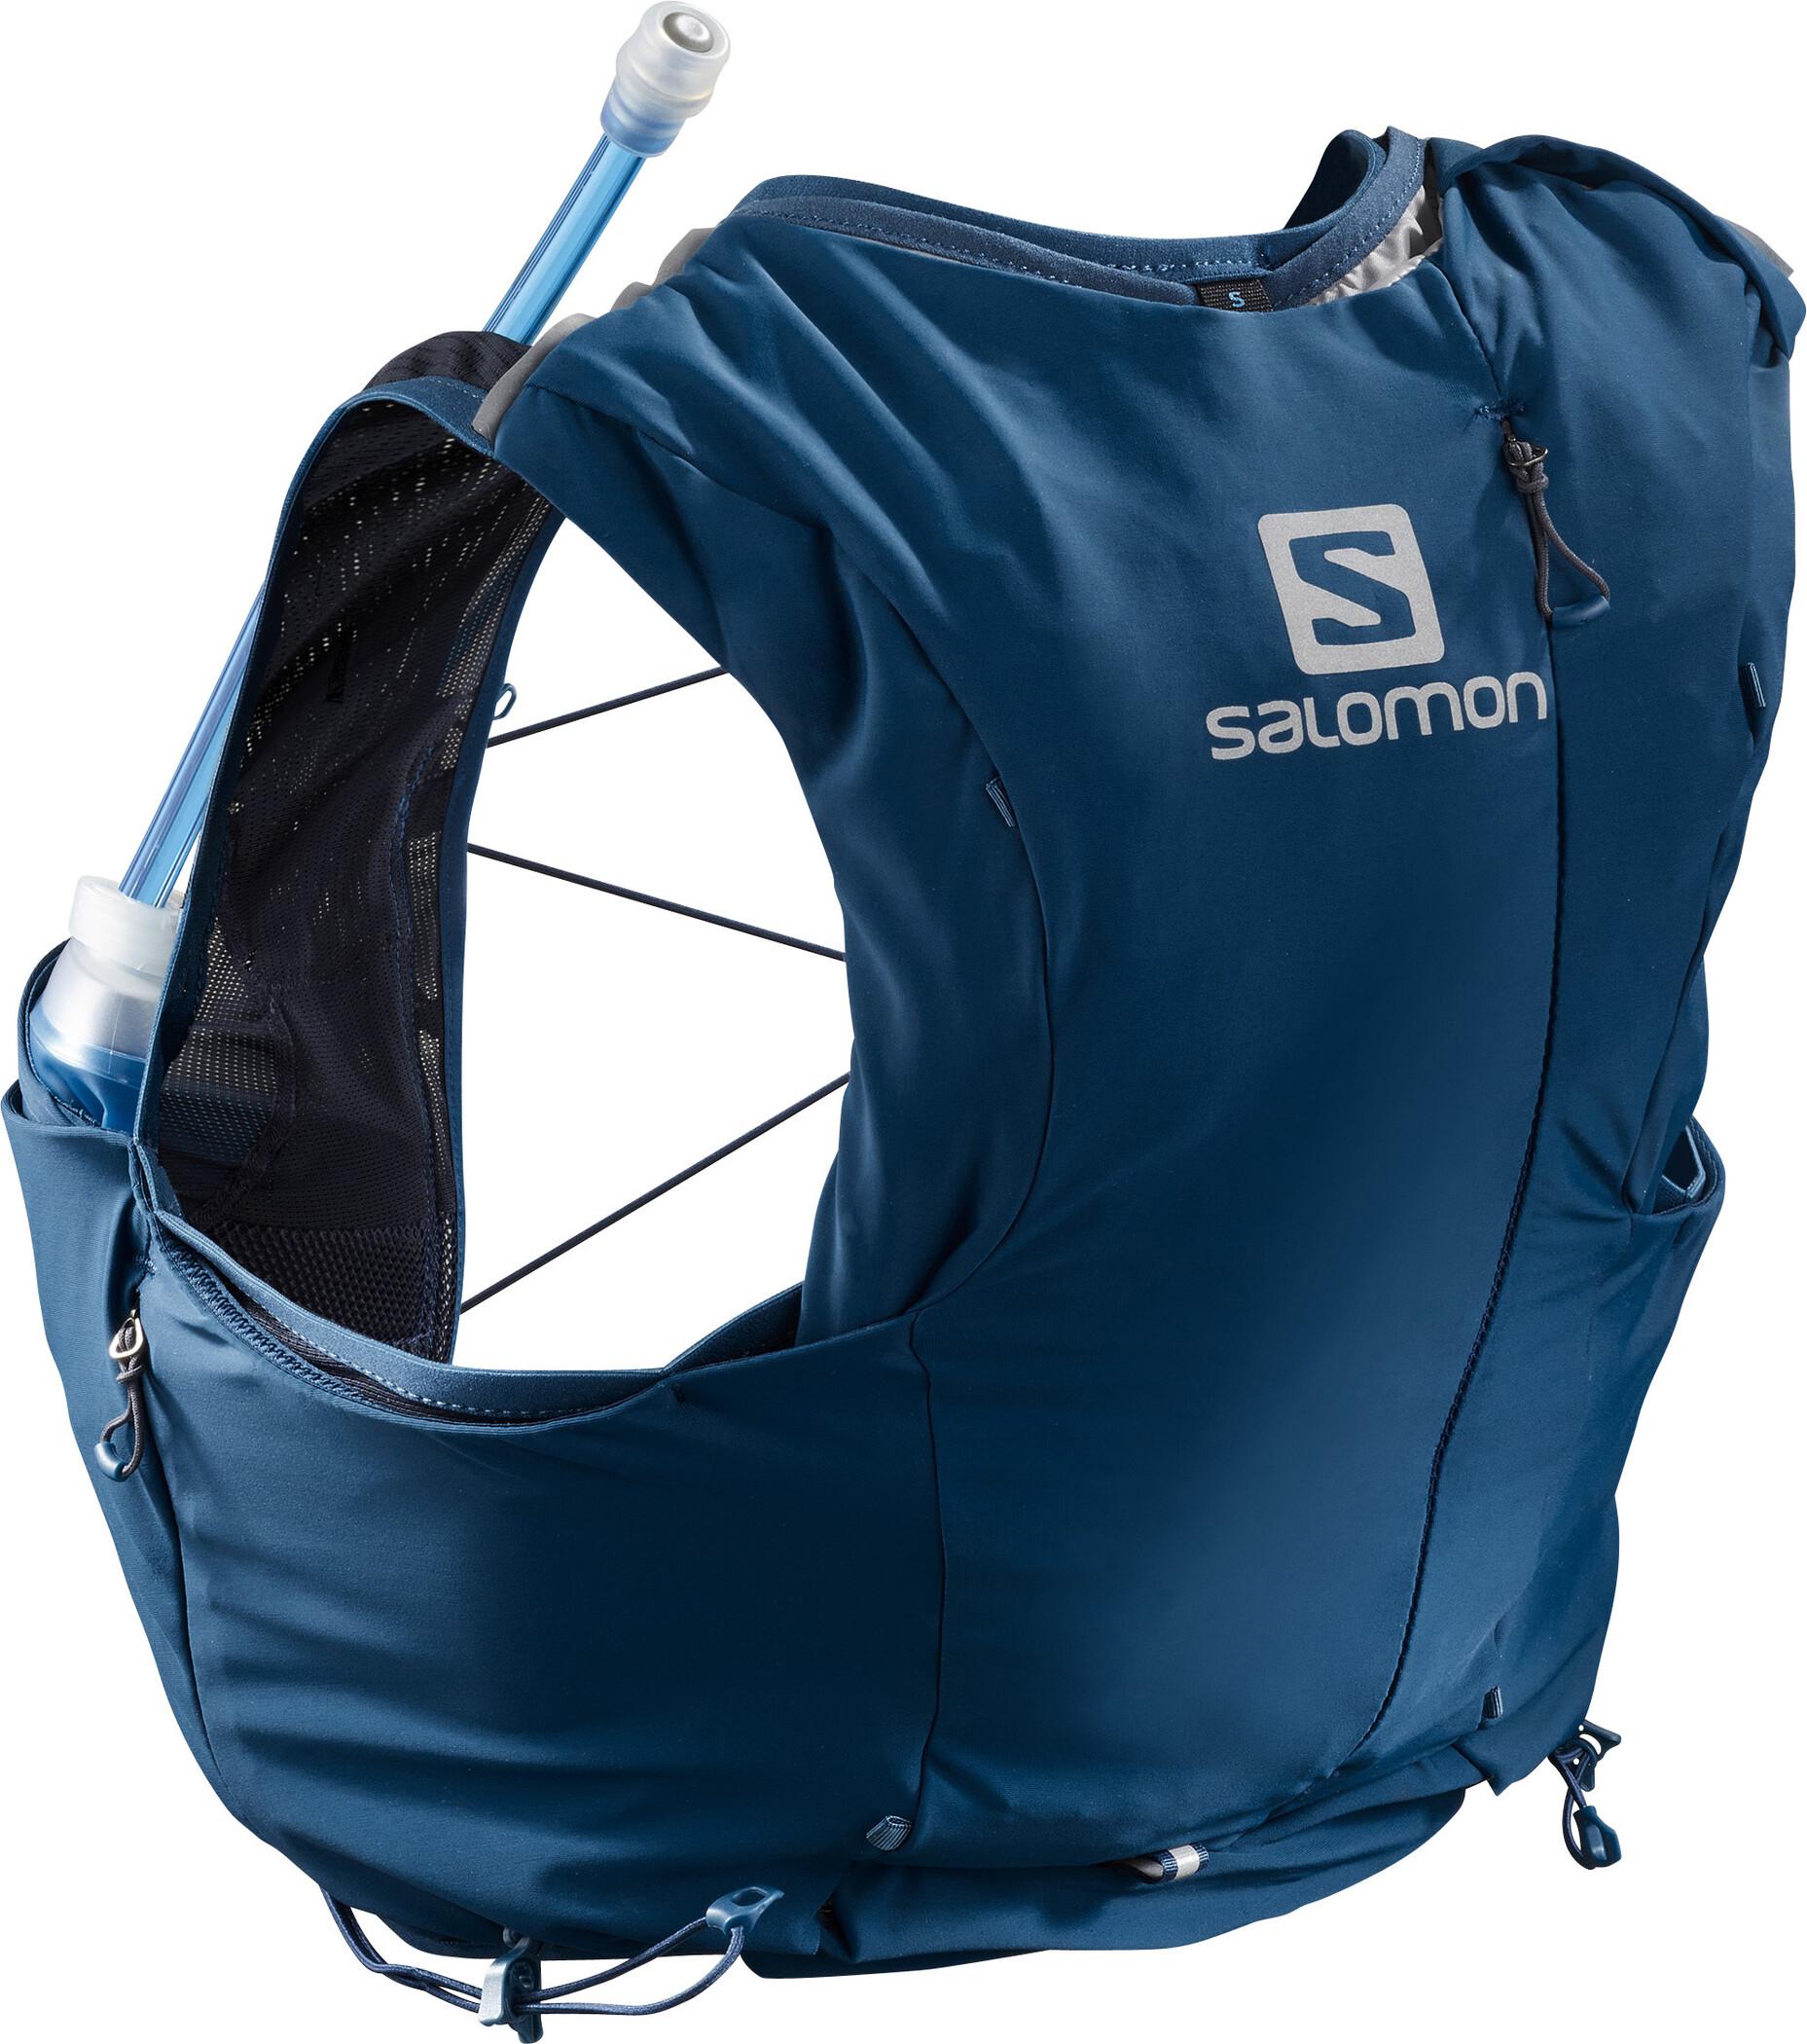 Salomon Adv Skin 8 Set Backpack Women poseidonnight sky